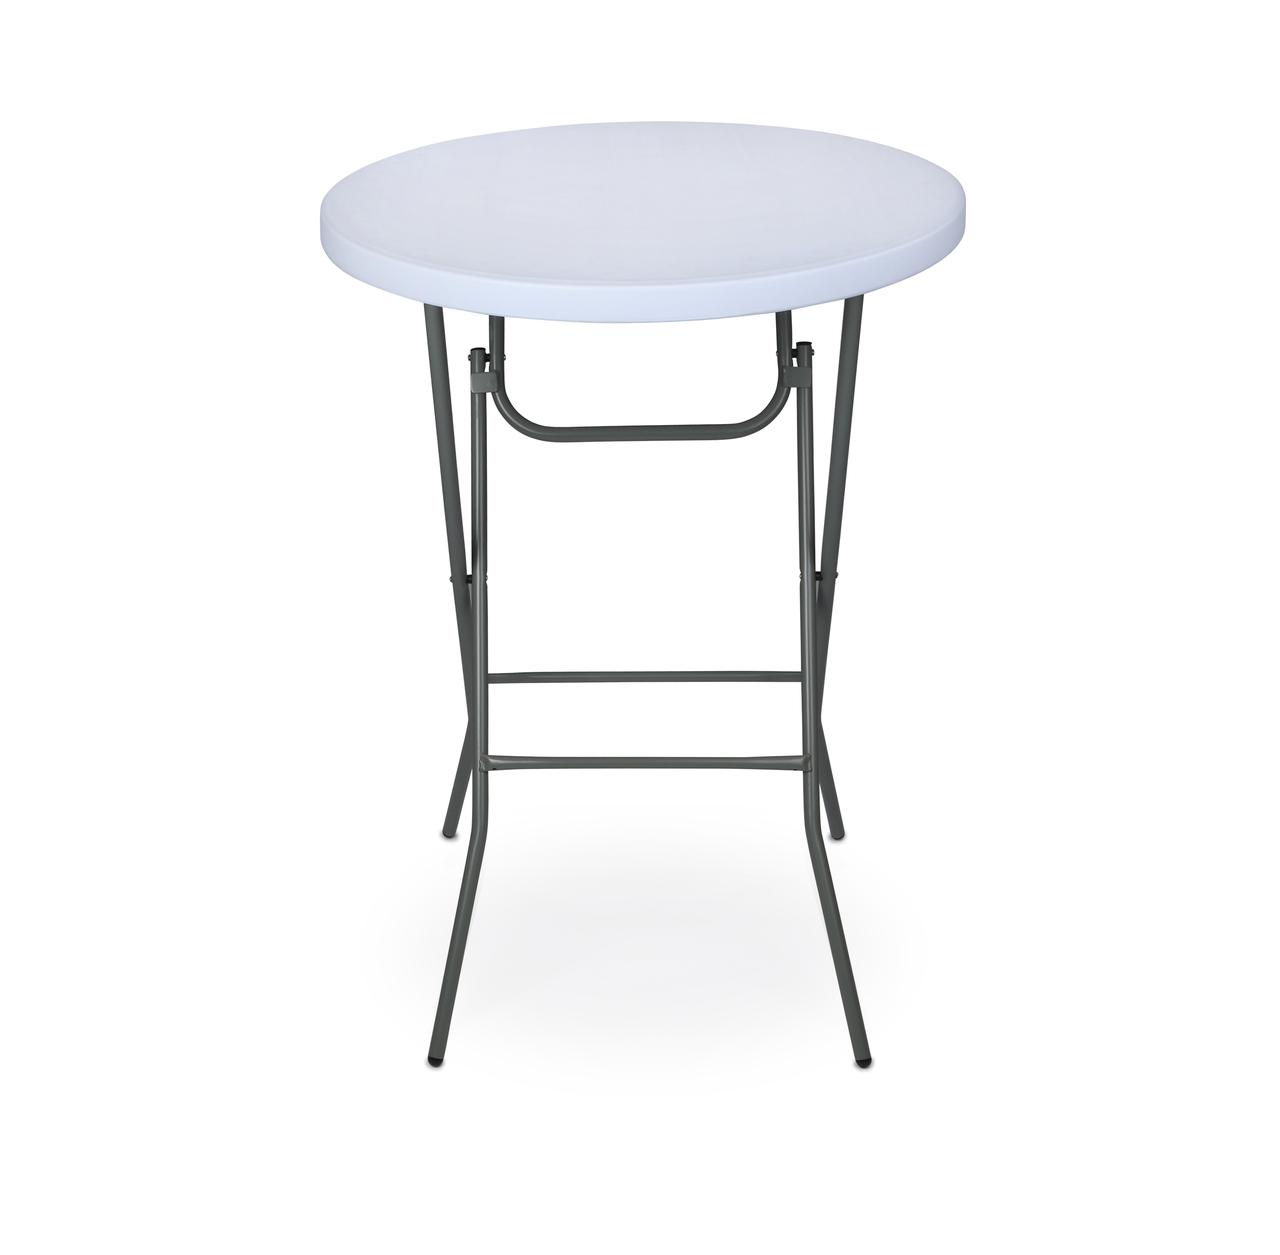 Rhinolite 32 Round Plastic Folding High Top Cocktail Table 43 5 Bar Height Folding Steel Frame